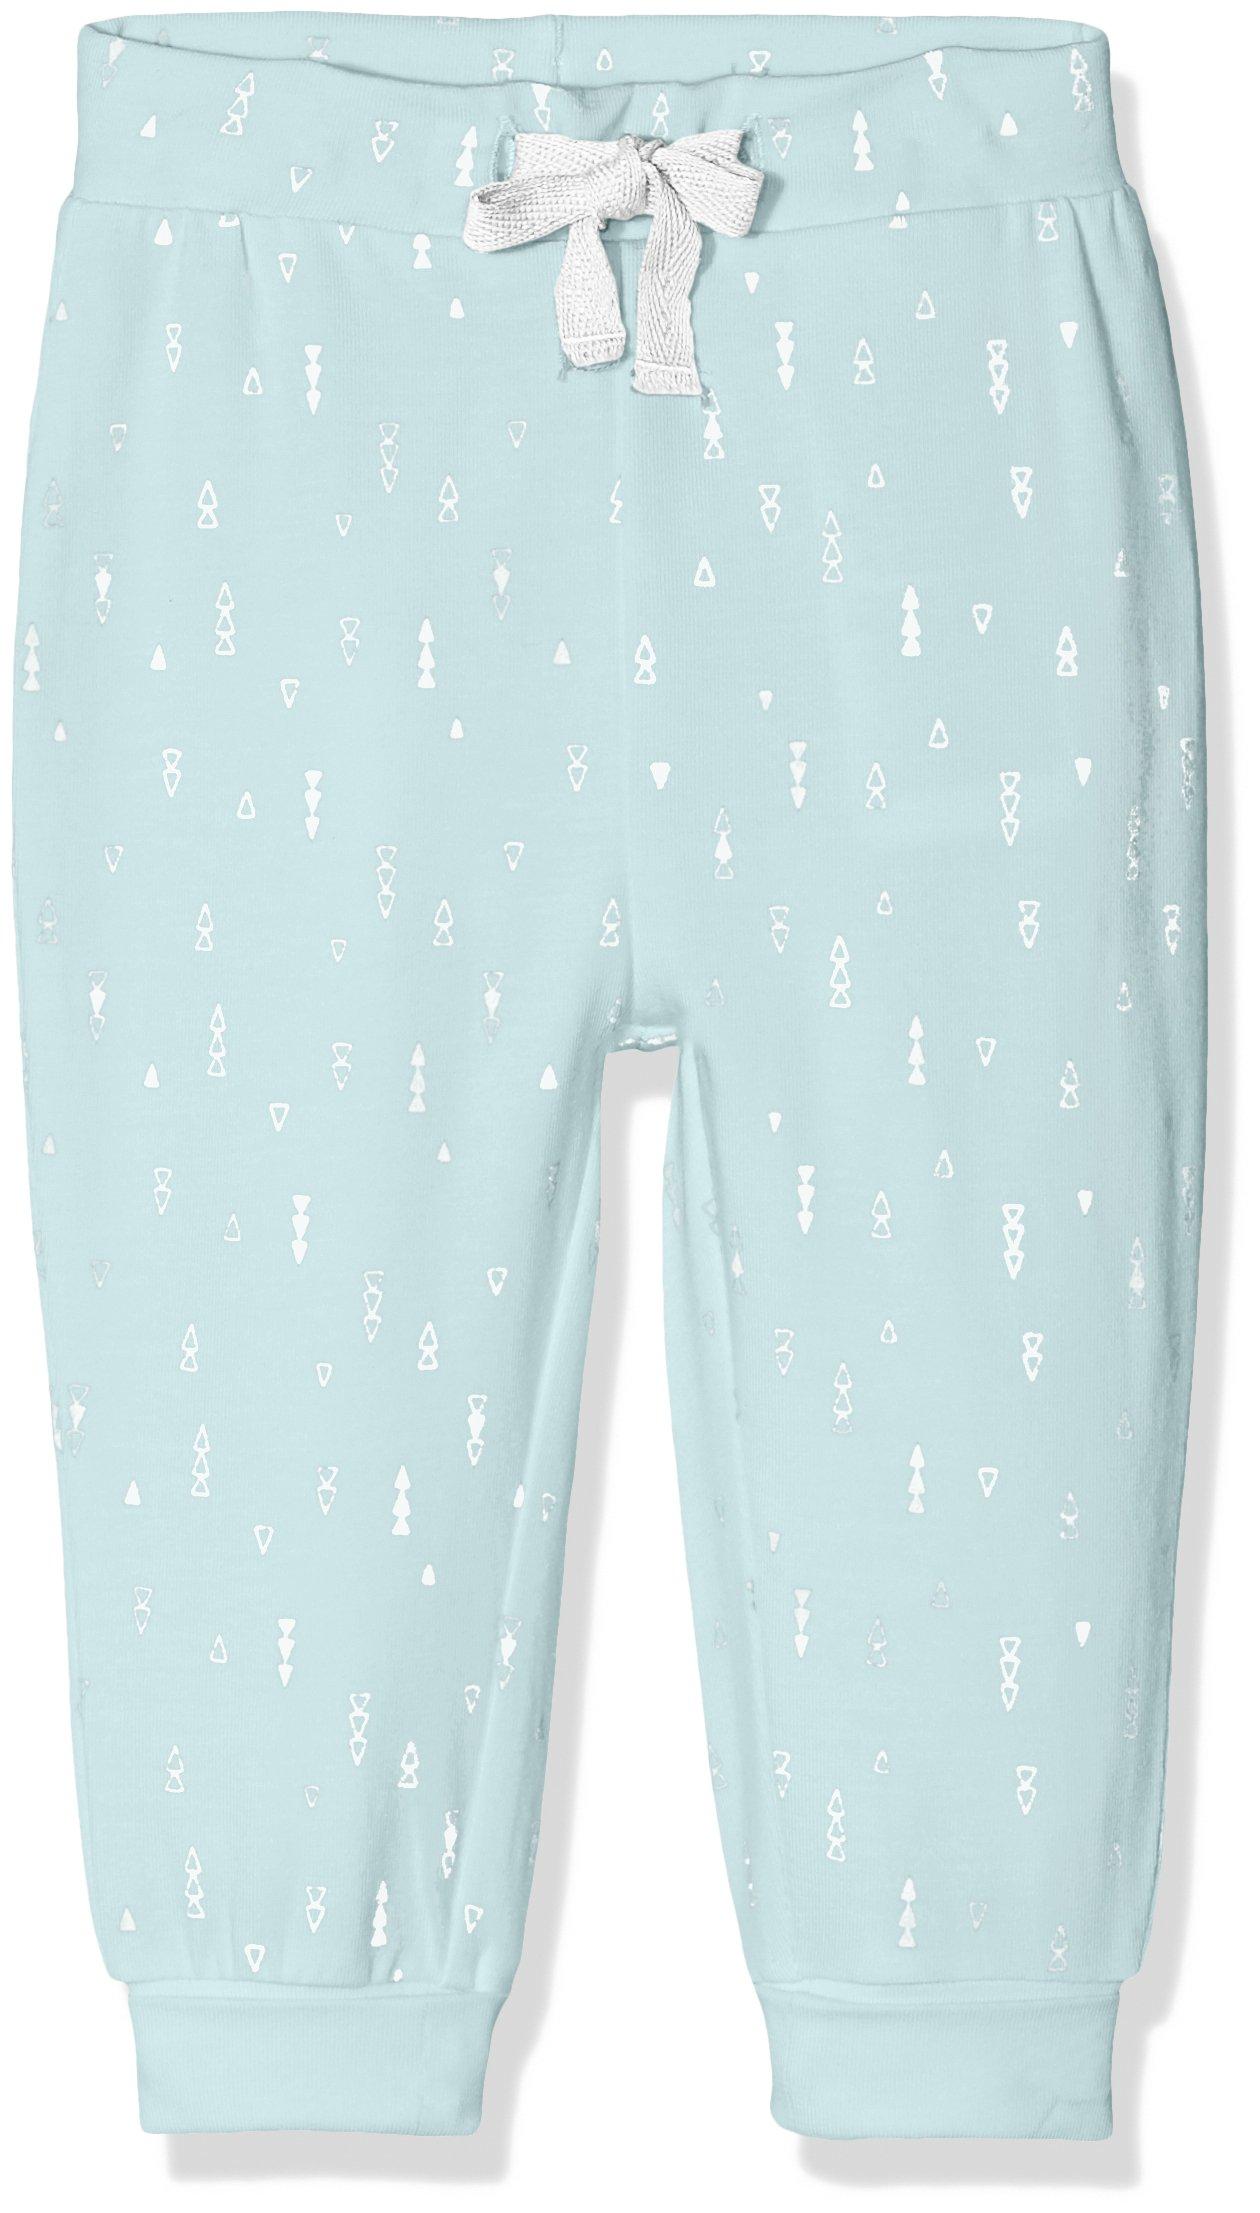 NAME IT Nbndelucious Pant Noos Pantalones para Bebés 1